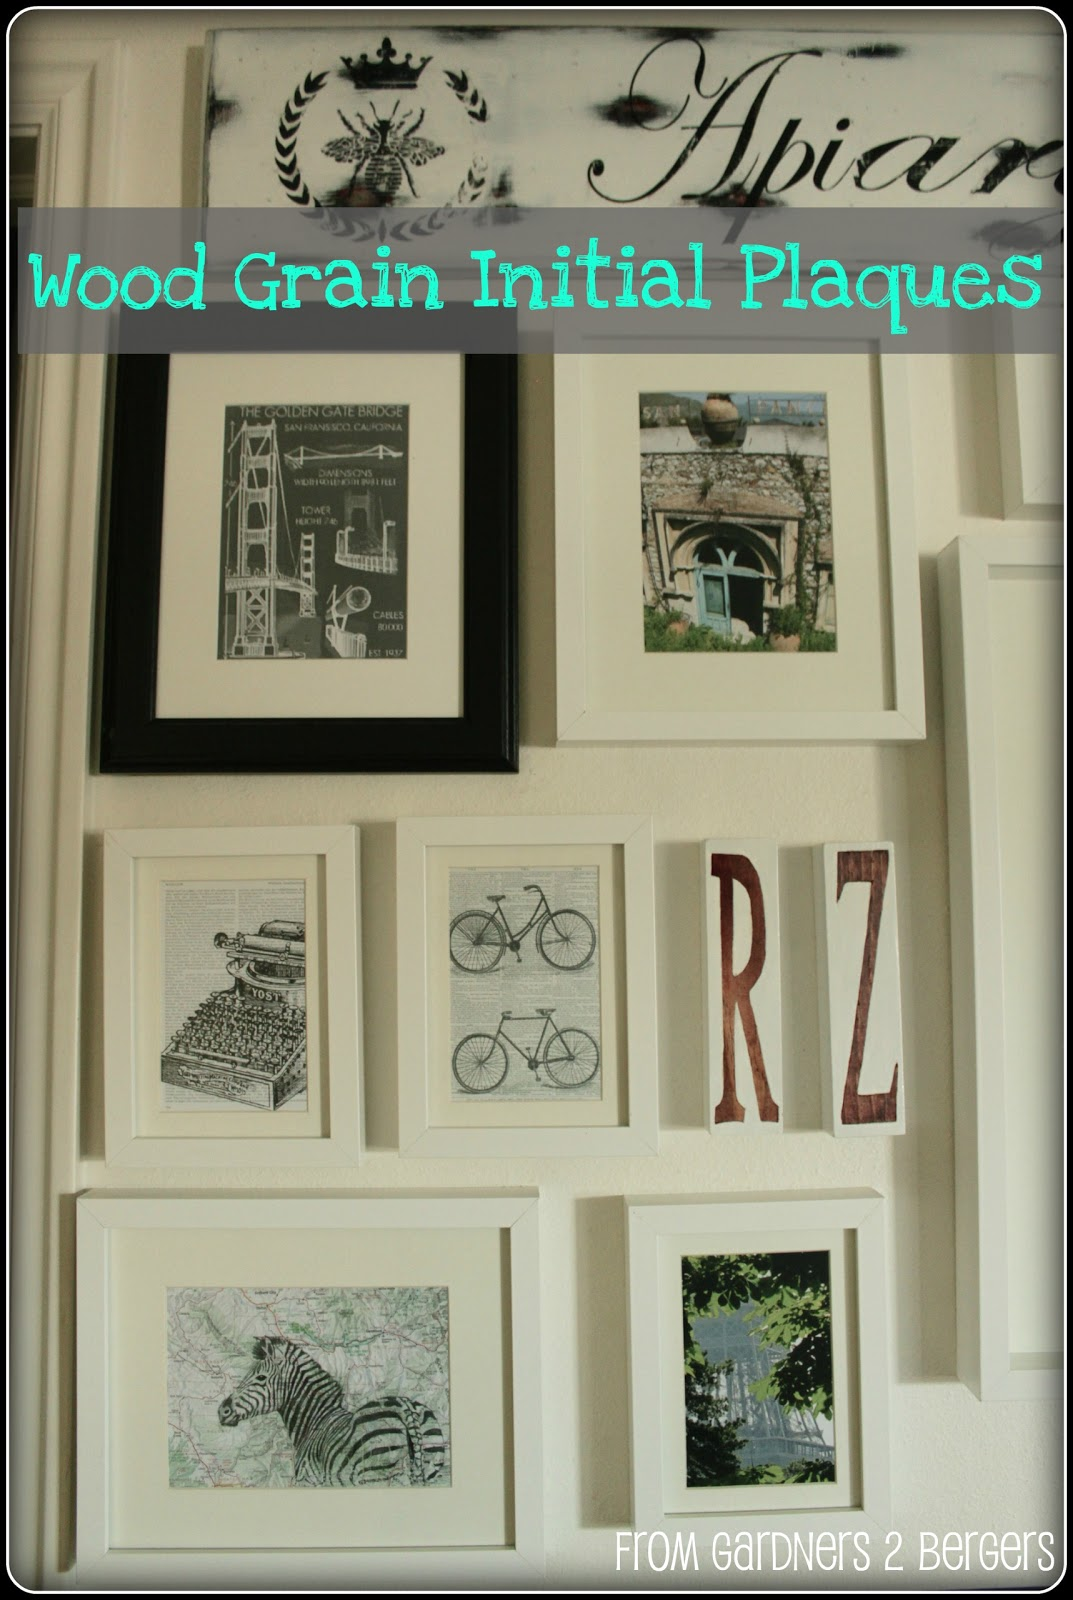 Wood-Grain-Initial-Plaques